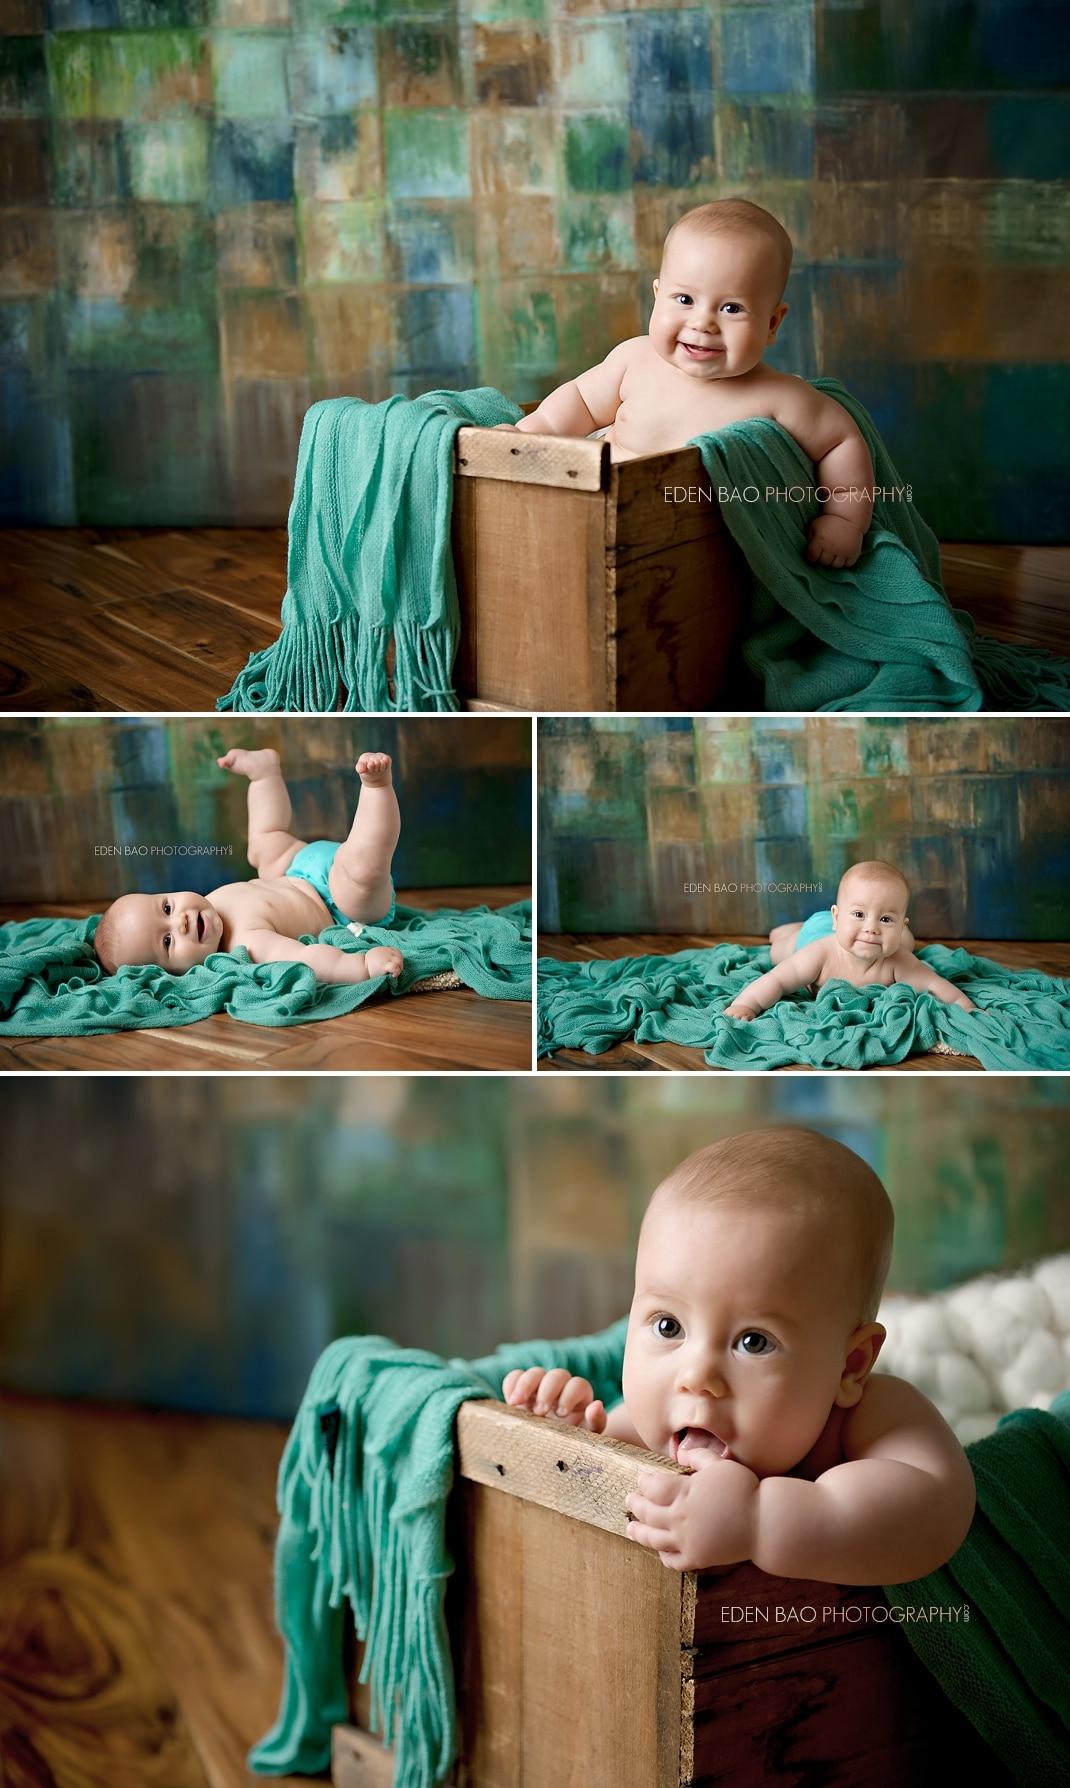 Vancouver BC Baby Photographer Eden Bao Blue teal color backdrop